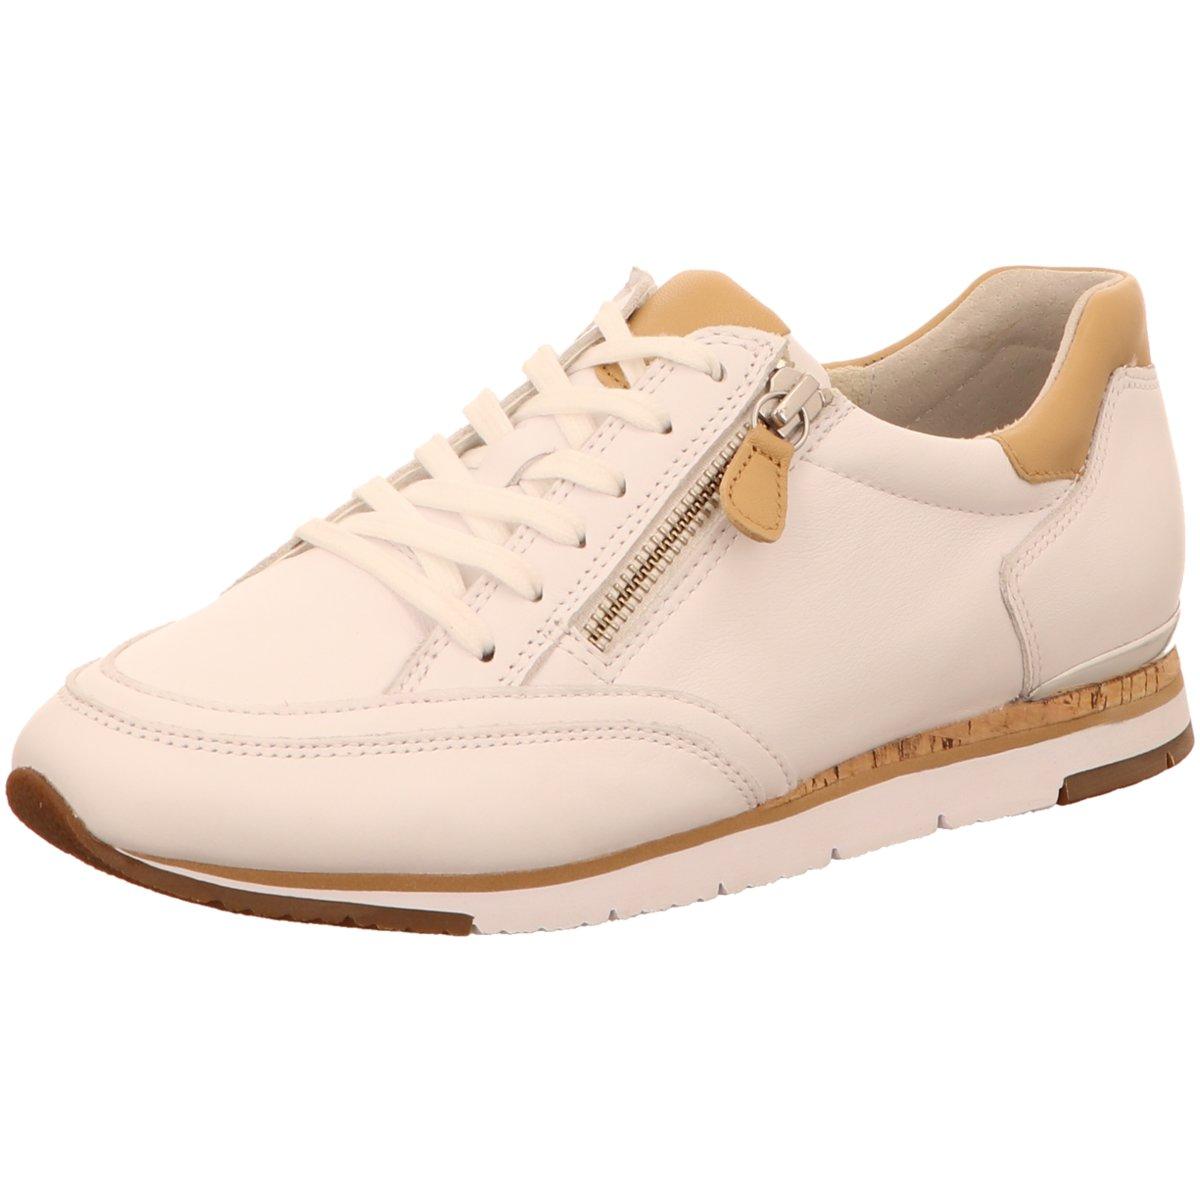 NEU Gabor Damen Sneaker 84.323.21 weiß 412296